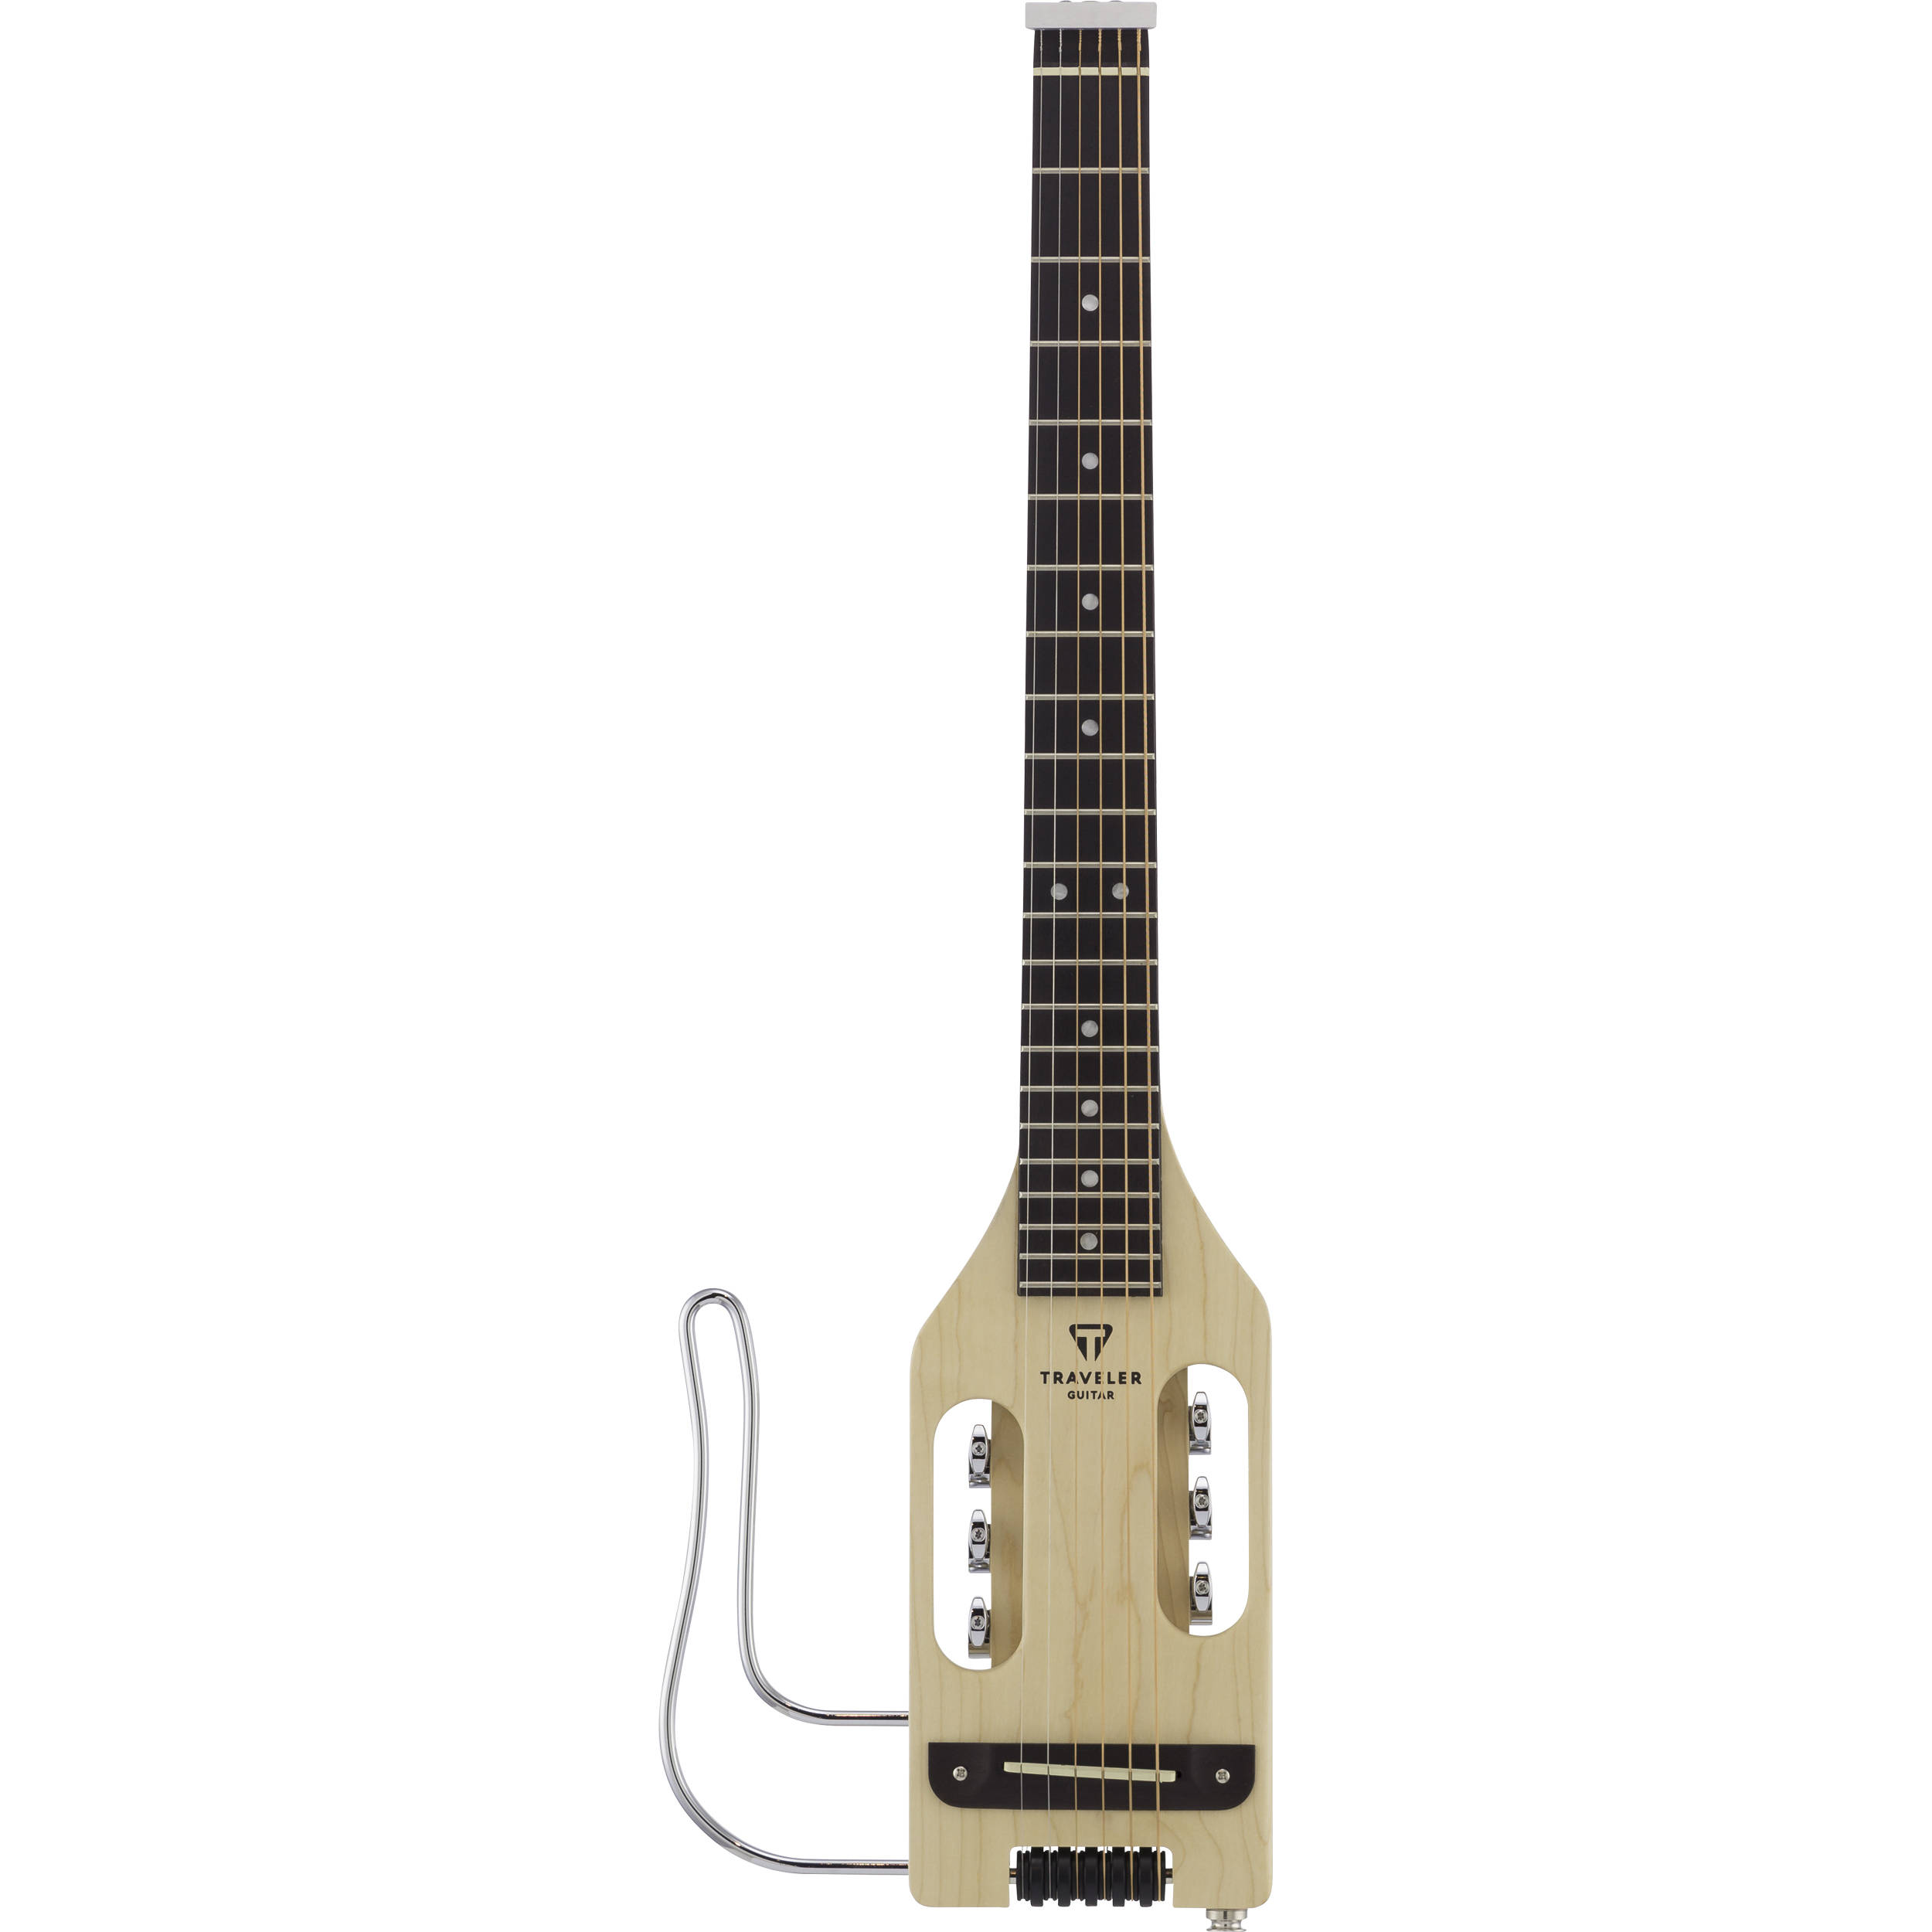 traveler guitar ulst nat lh ultra light left handed solid body